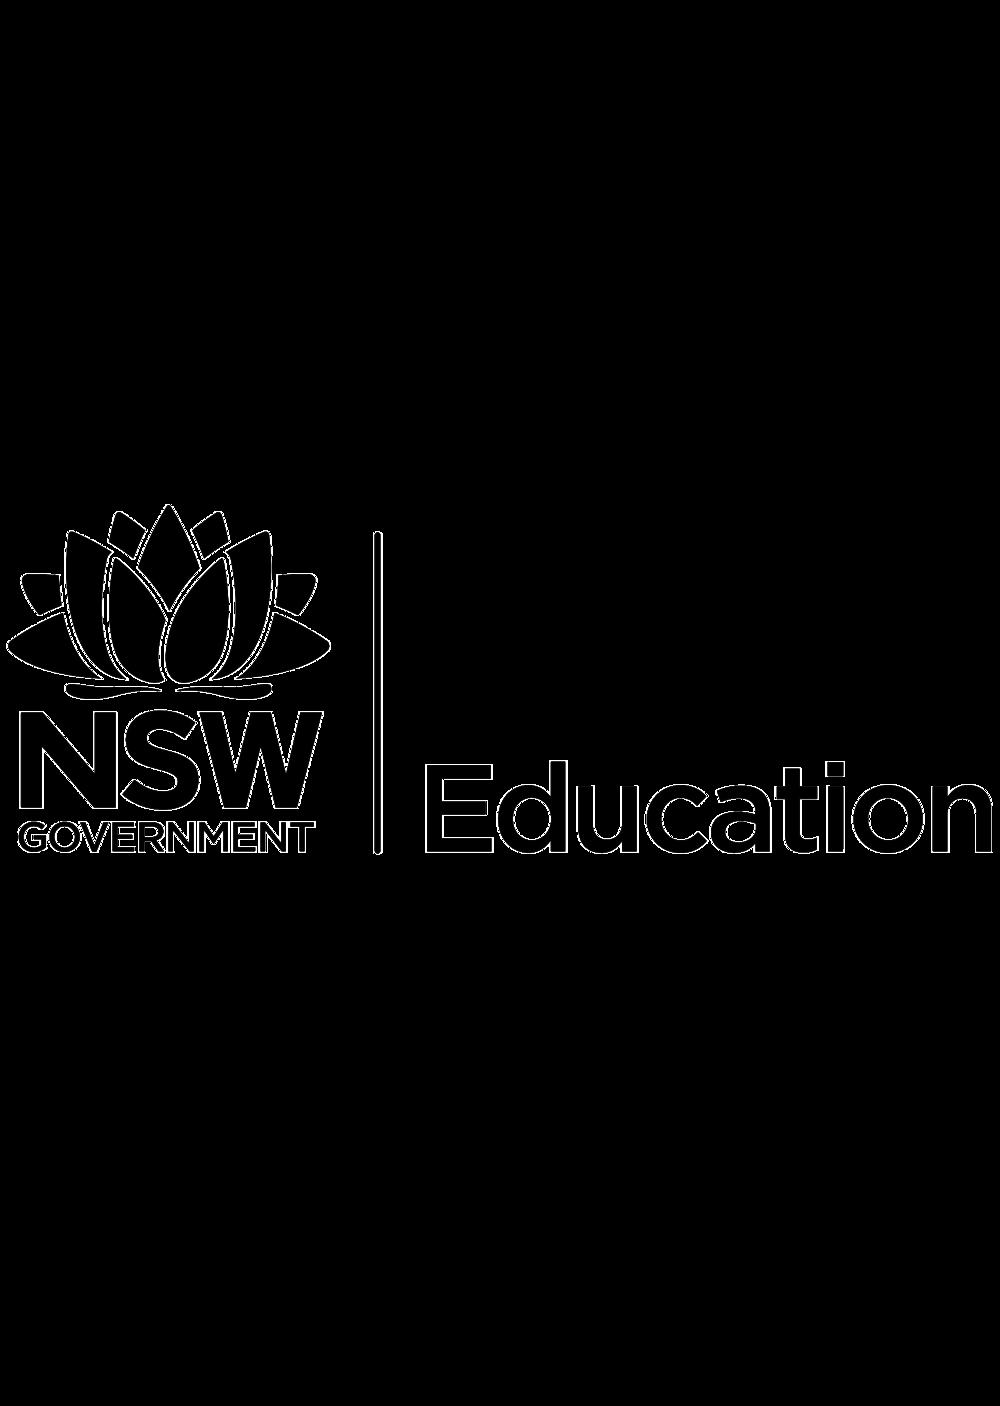 NSW Education Logo